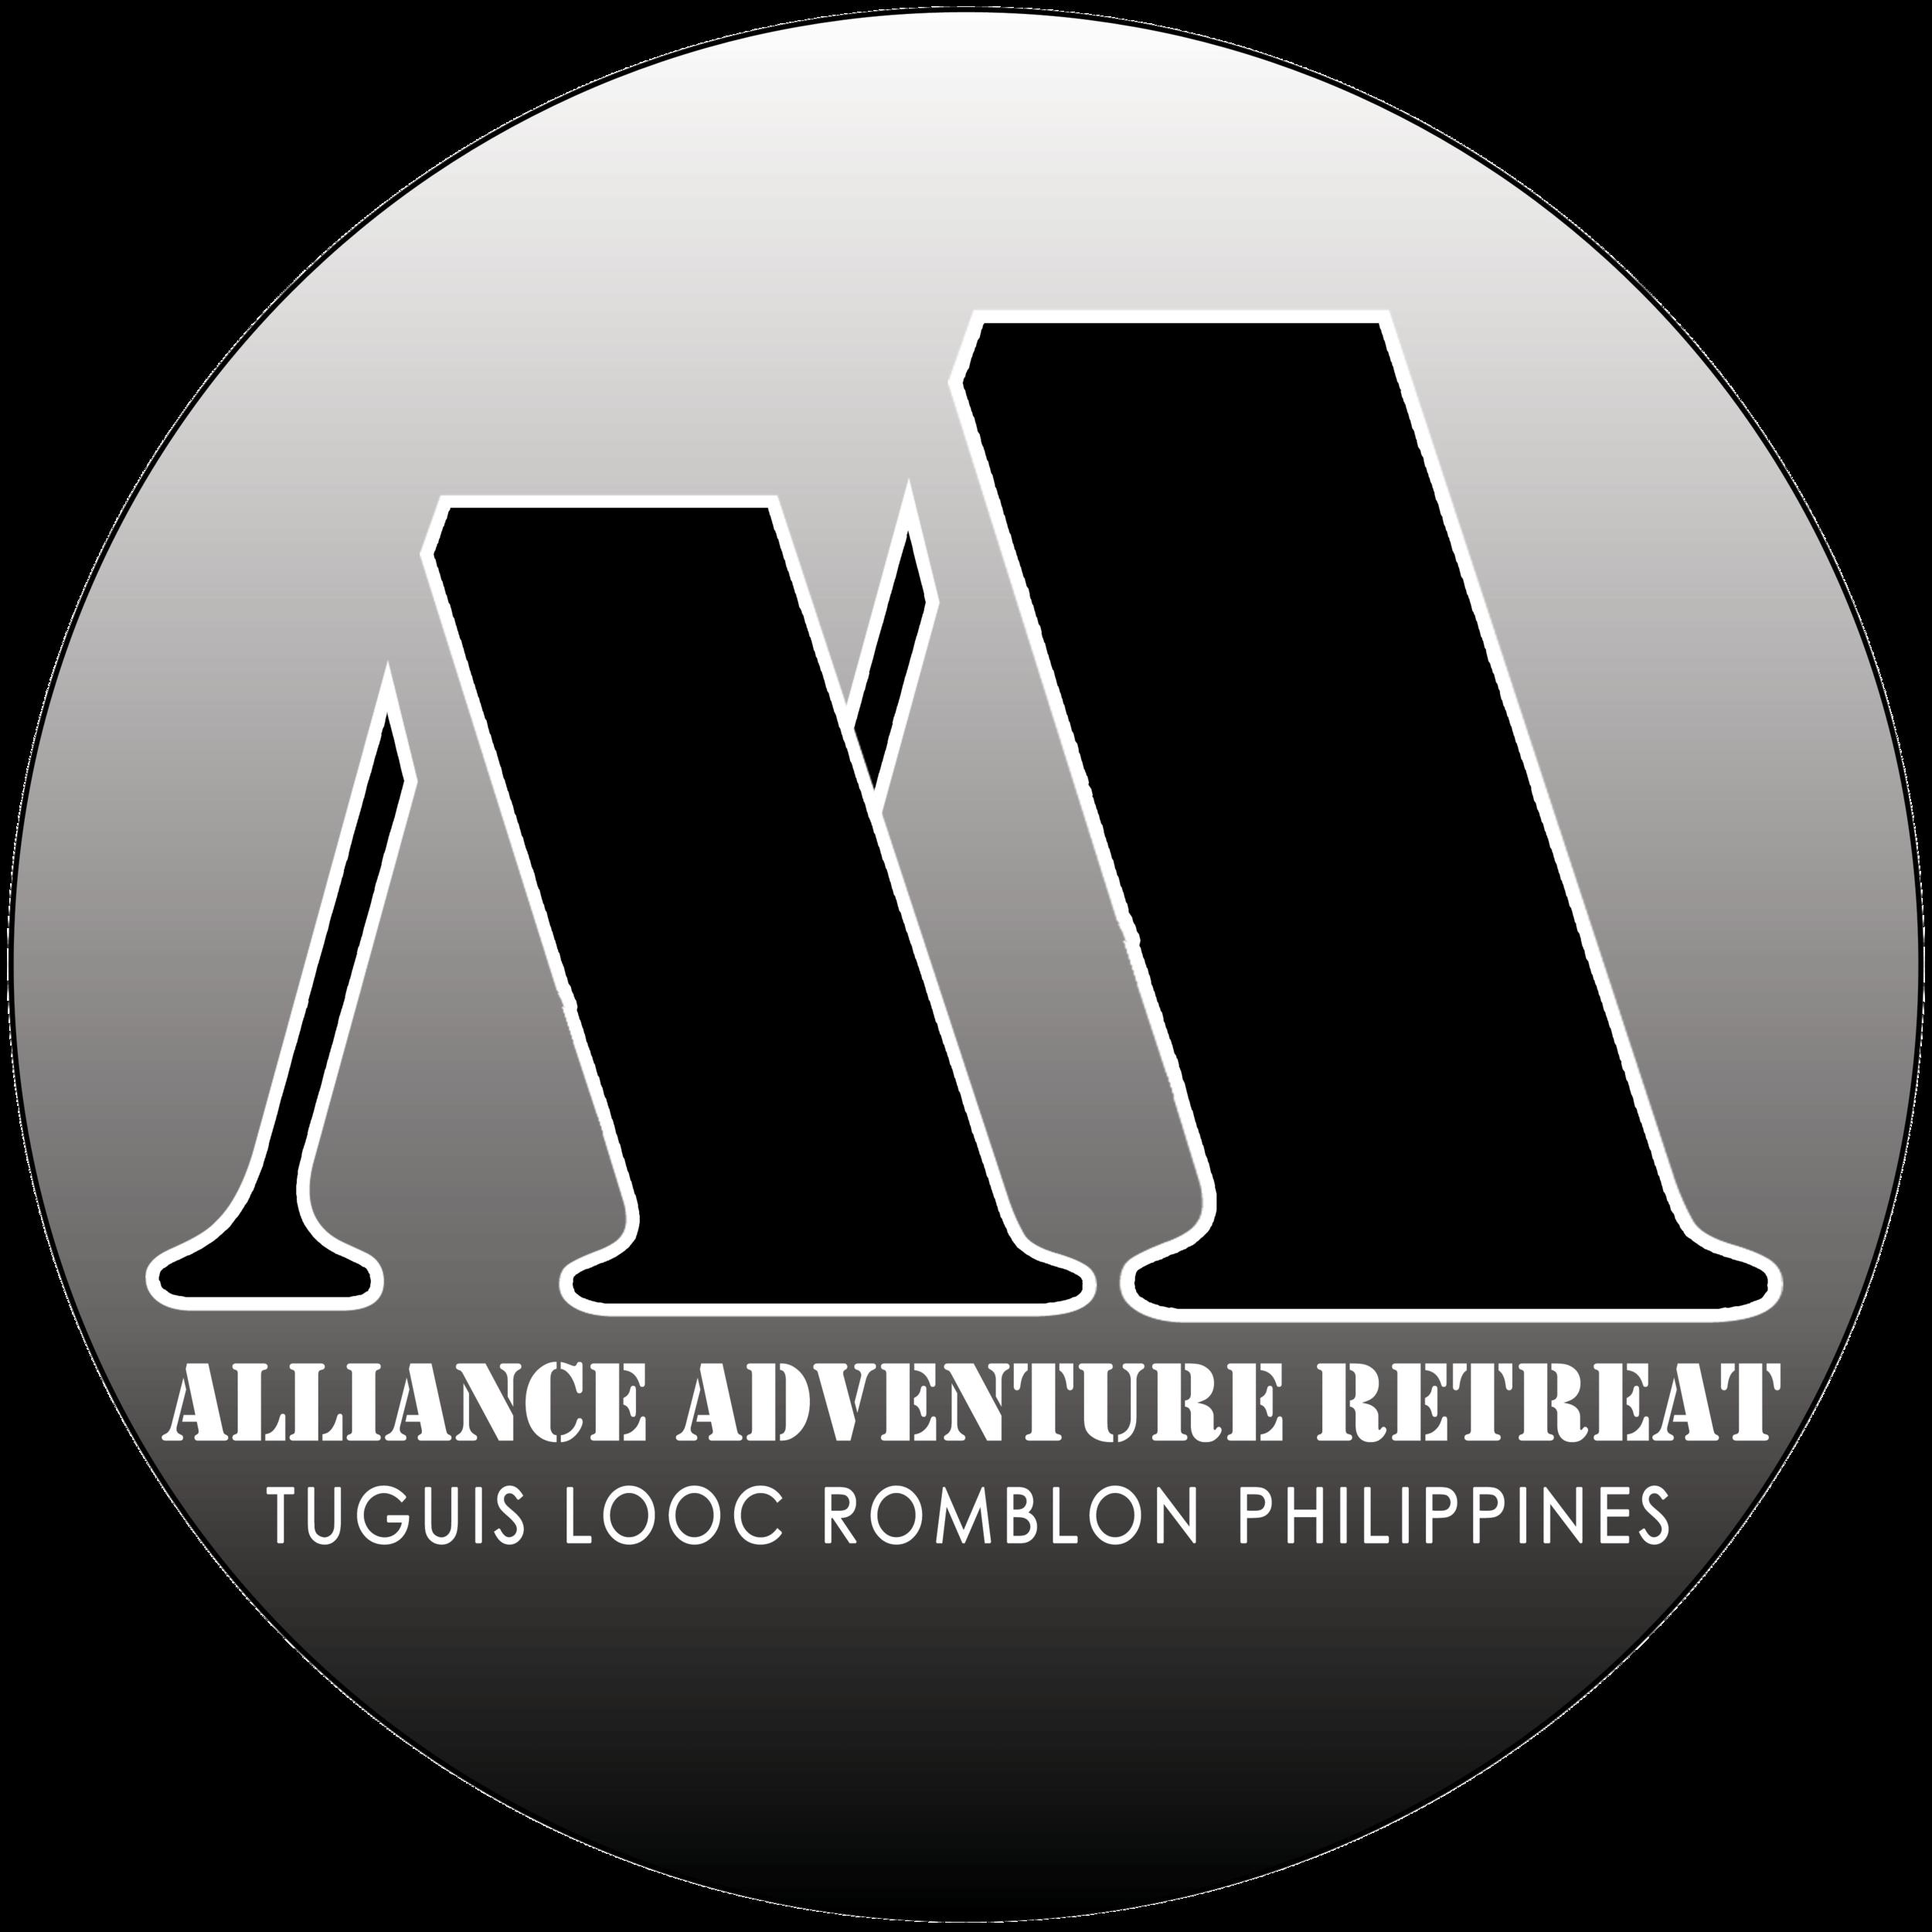 alliance-cummings-bilog-new1-03.png